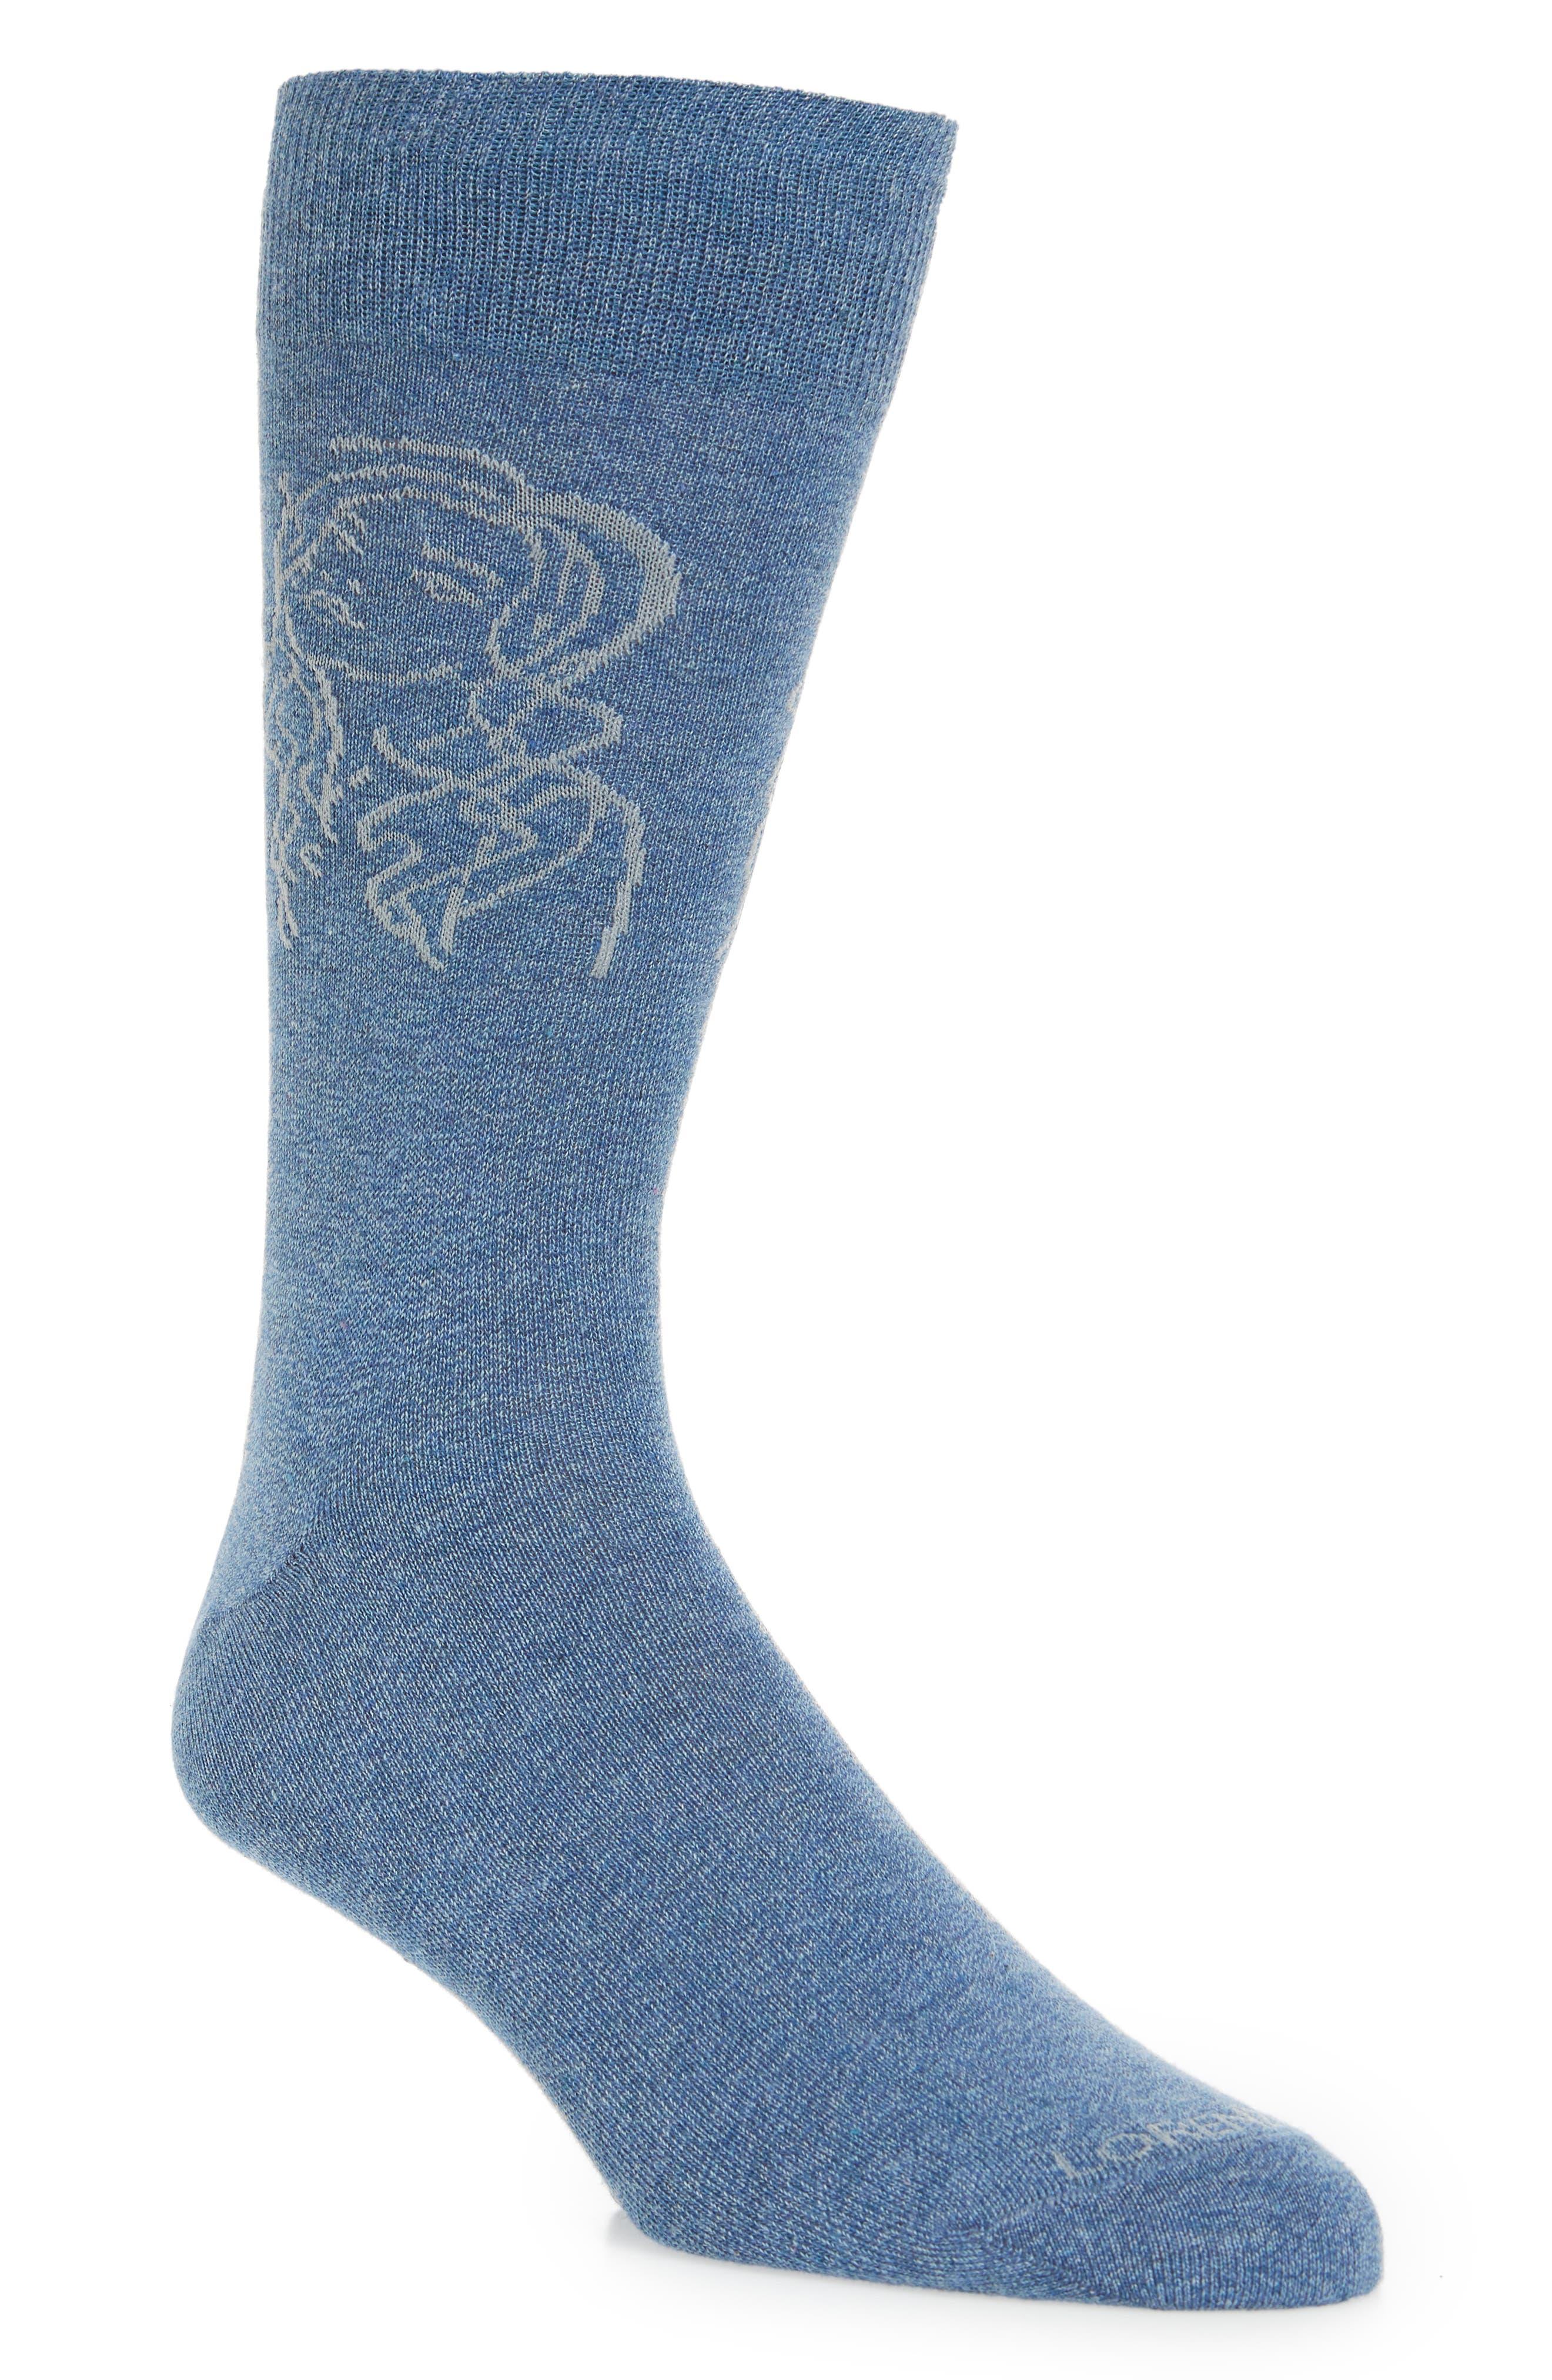 Girl 2 Socks,                             Main thumbnail 1, color,                             Denim